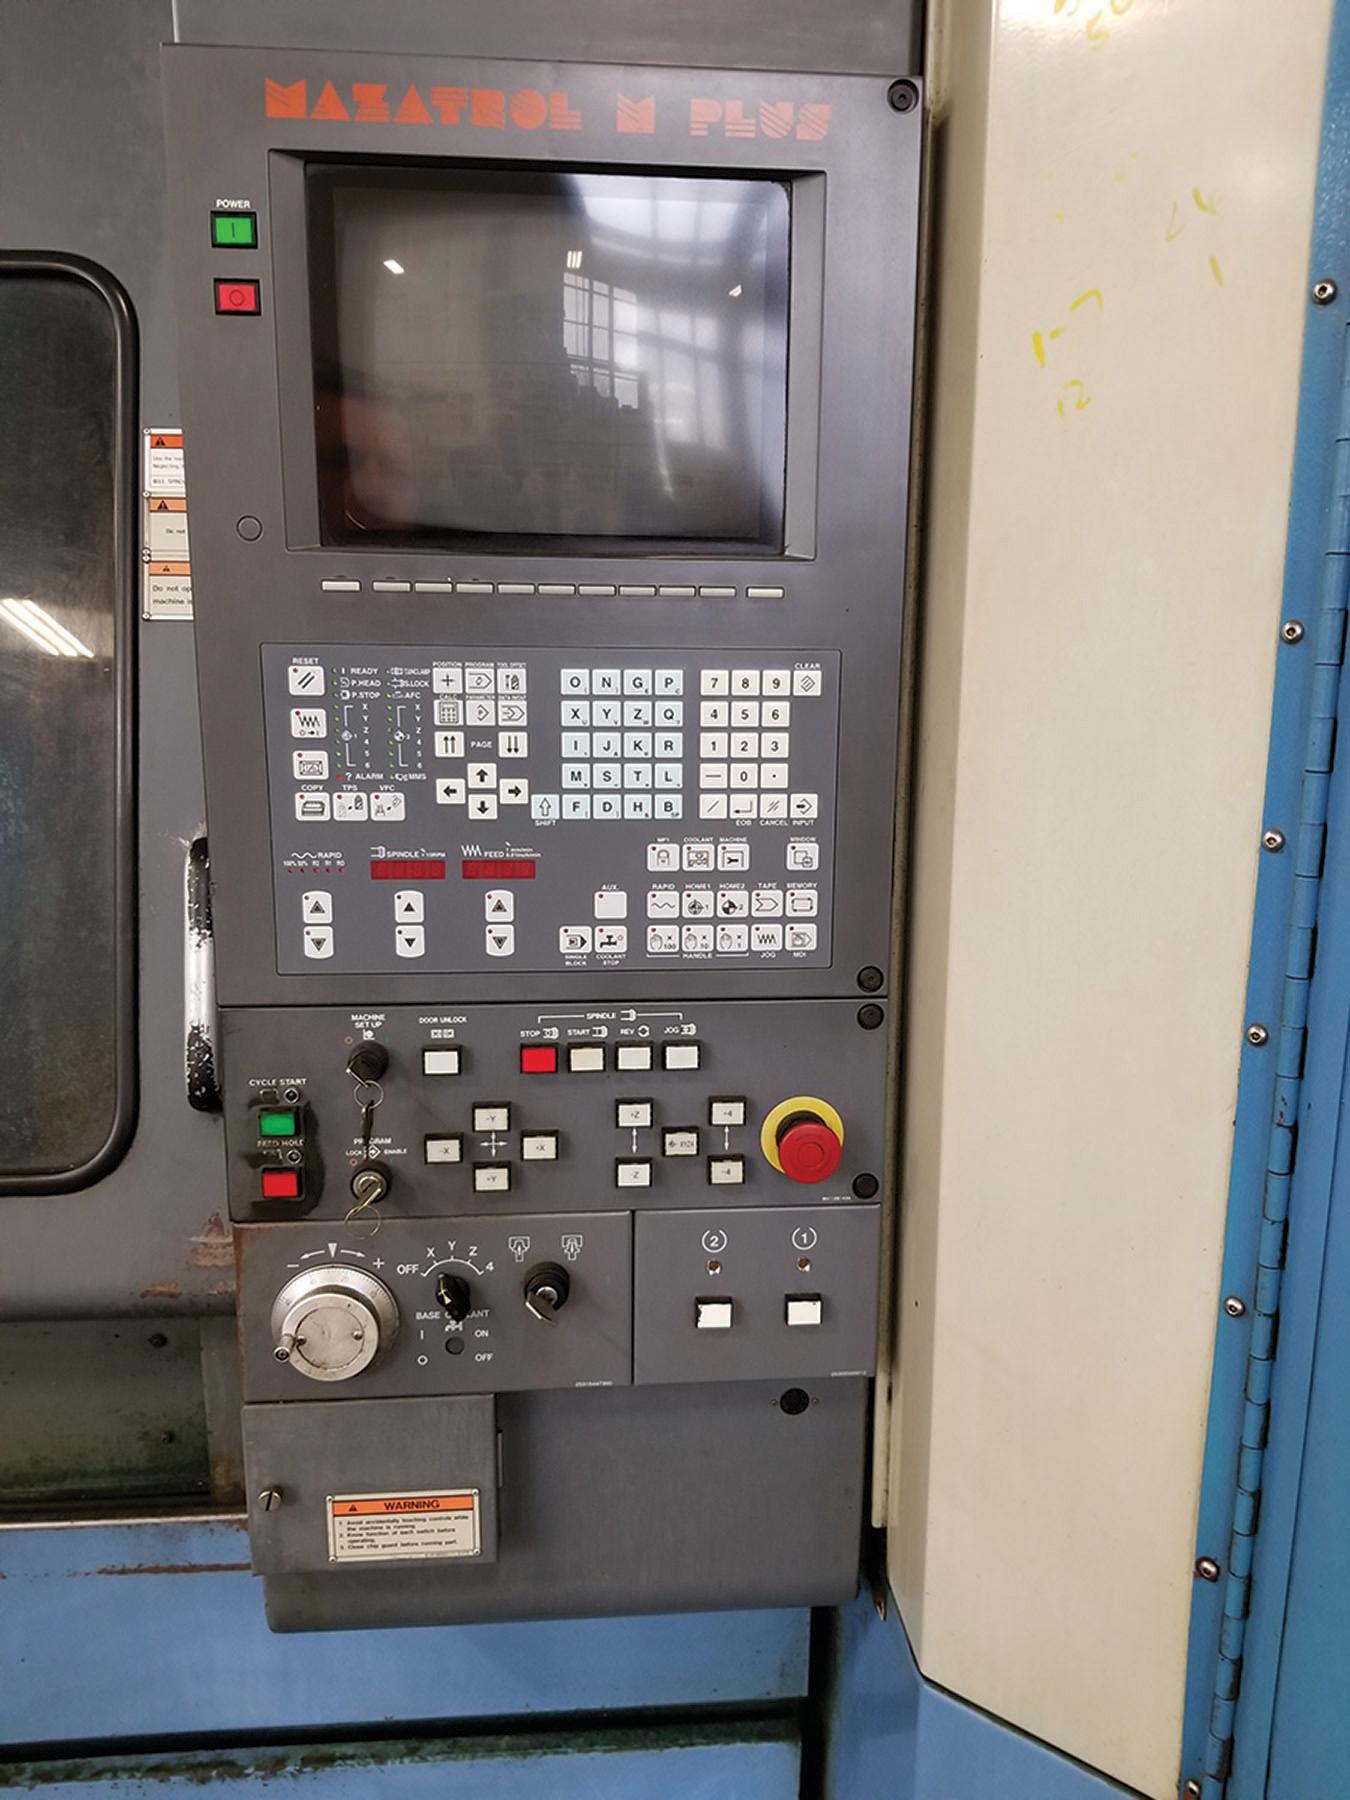 Lot 3 - 1992 MAZAK FJV-25 CNC VERTICAL MACHINING CENTER, S/N 134677, TRAVELS: 10.04/20.08'` X-AXIS, 40.